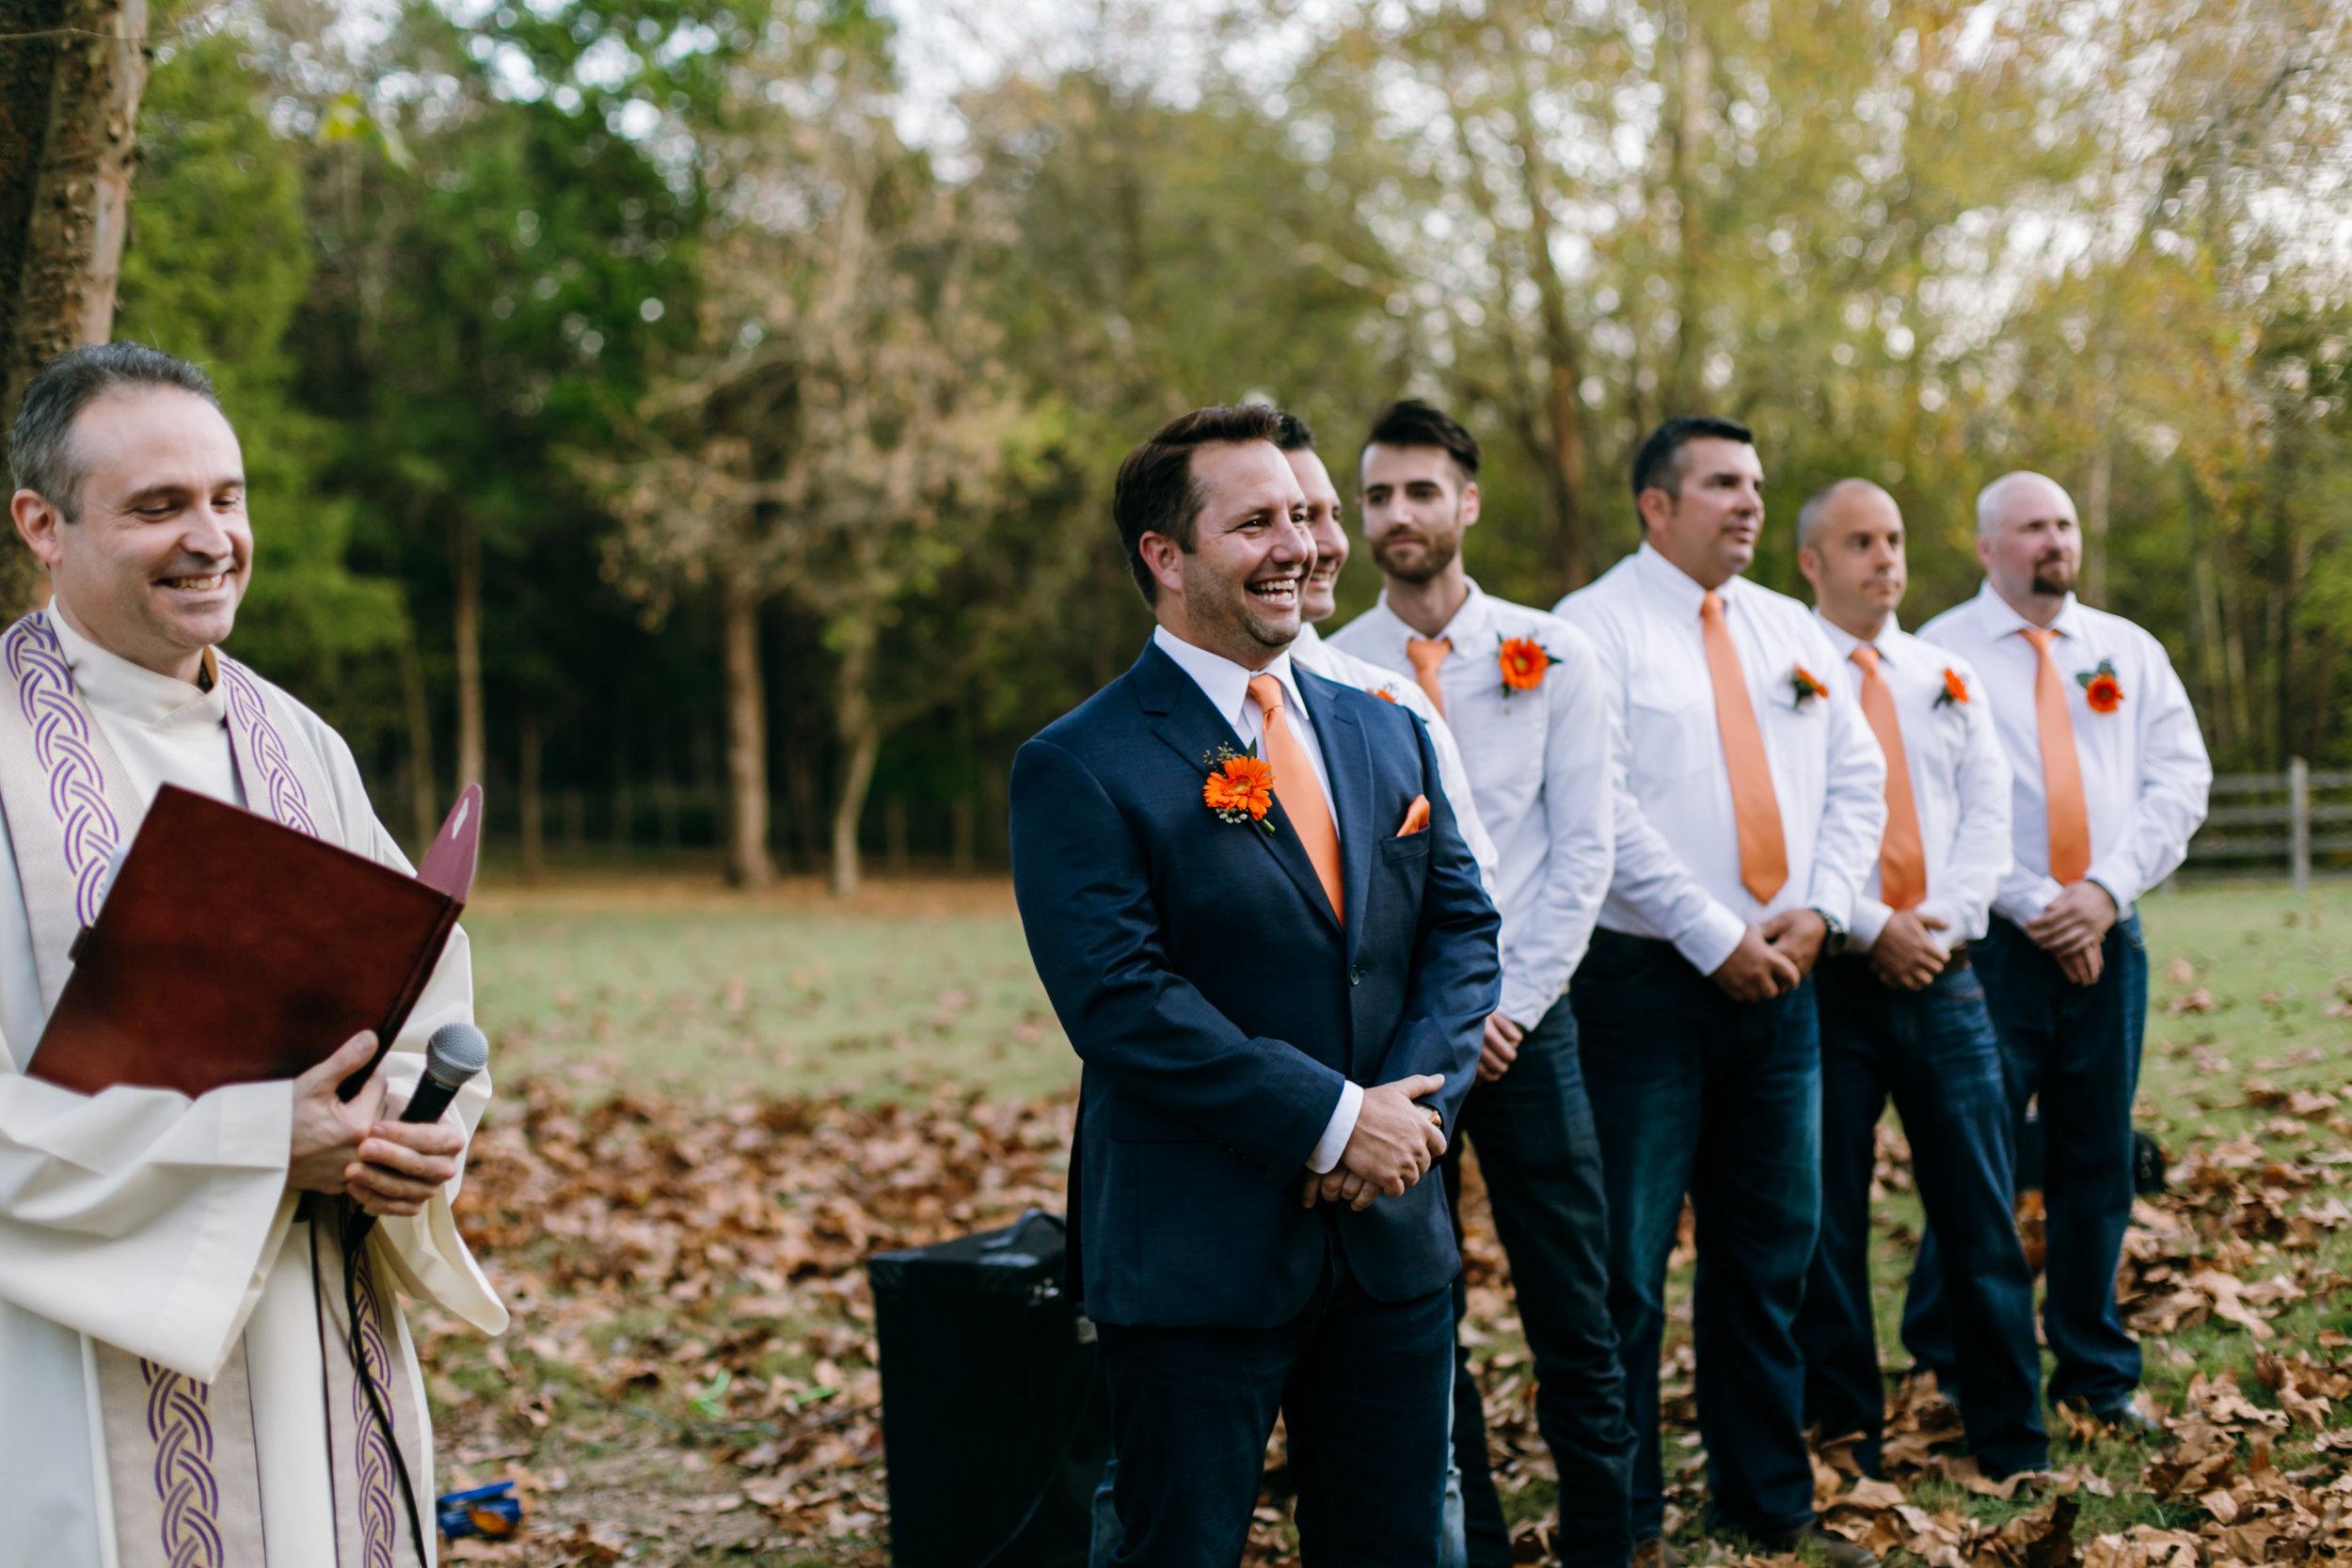 KaraNixonWeddings-Nashville-TN-Wedding-63.jpg